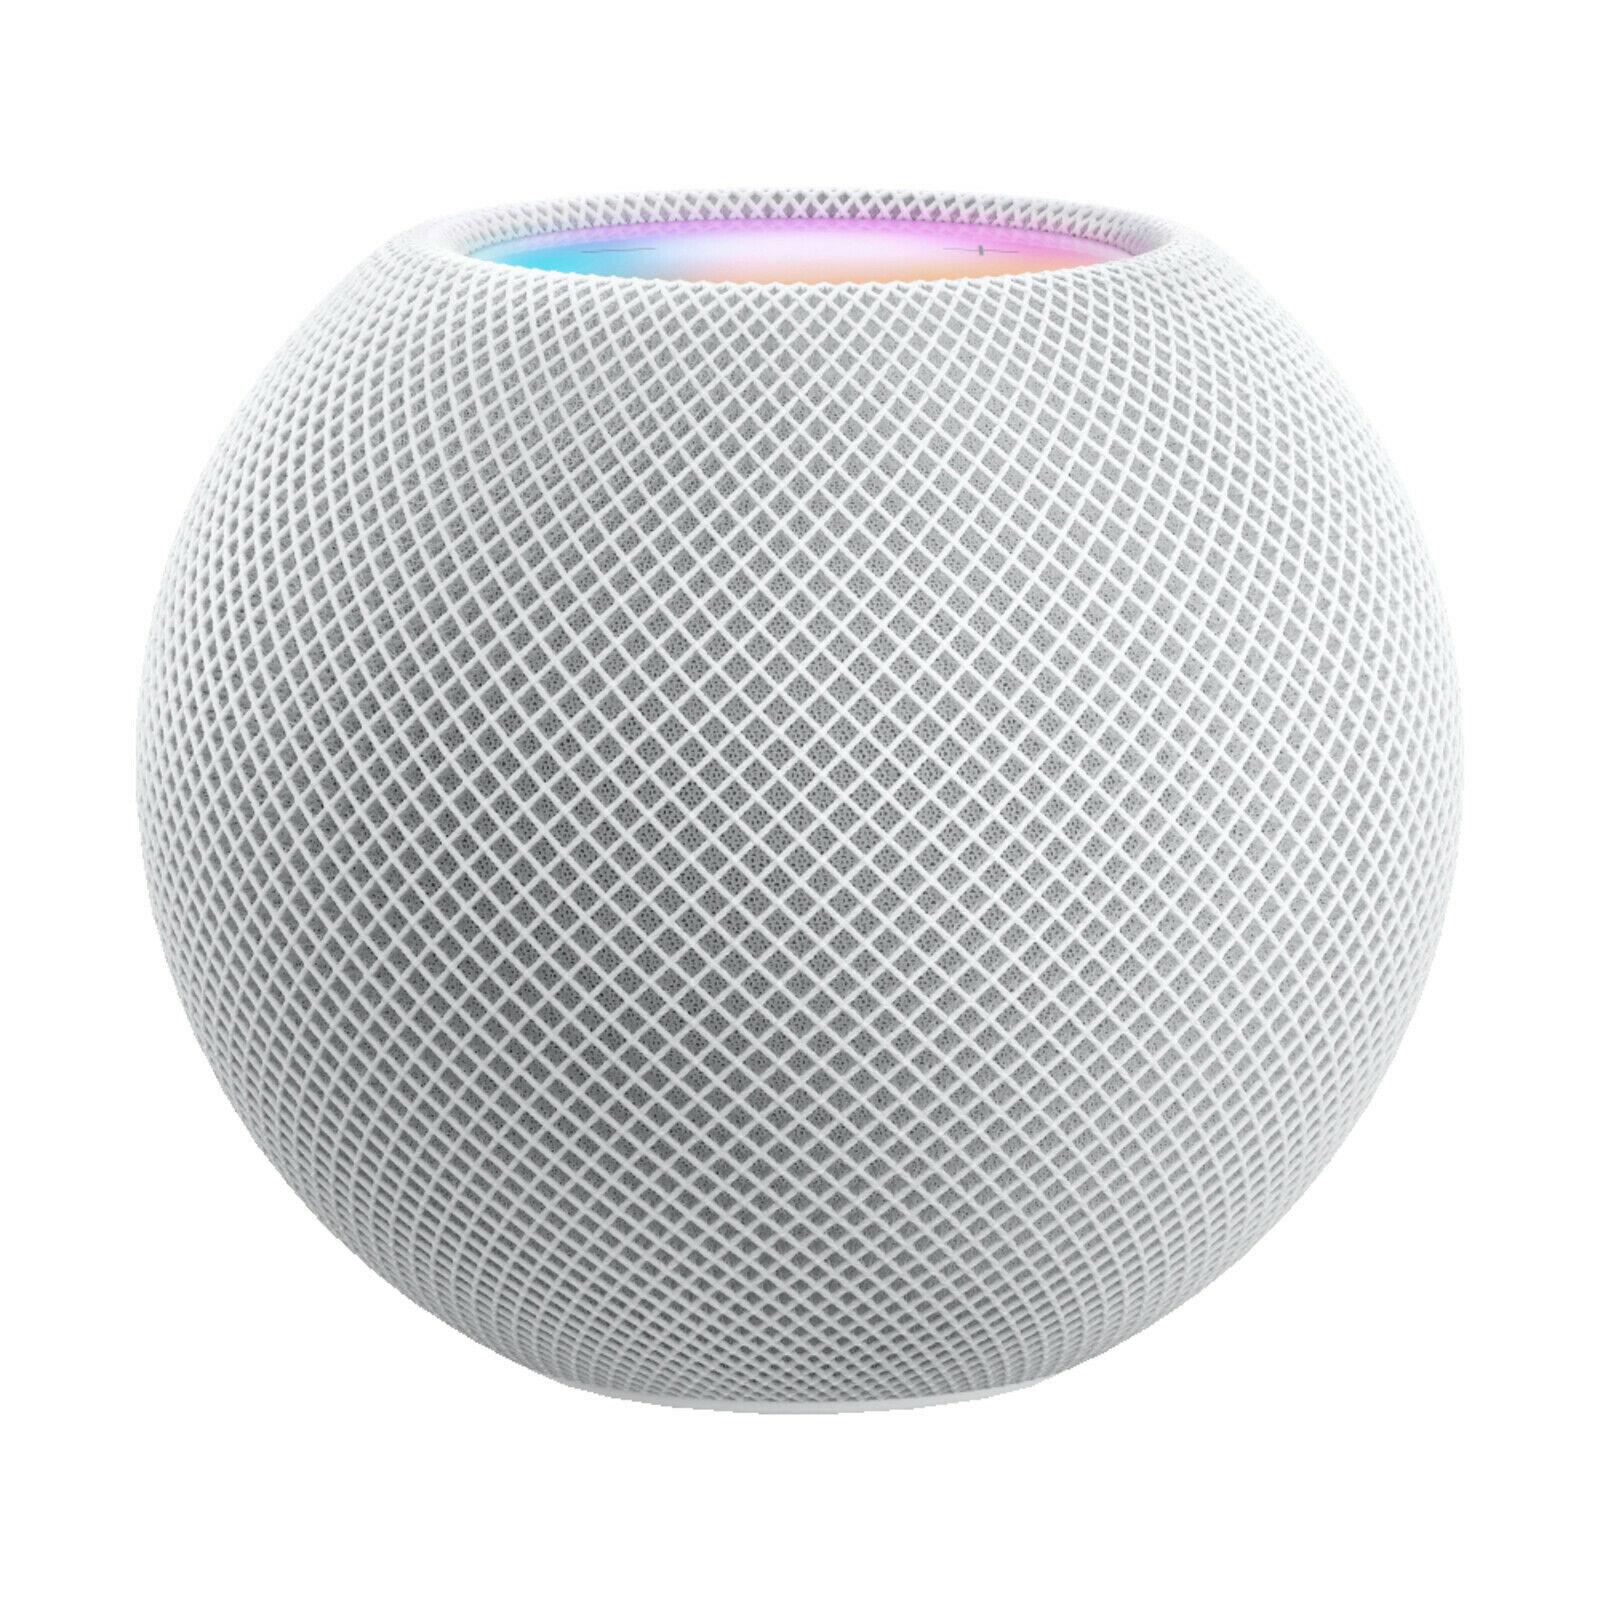 Apple HomePod Mini Smart Speaker (WLAN (WiFi), Bluetooth) weiß [eBay MediaMarkt]